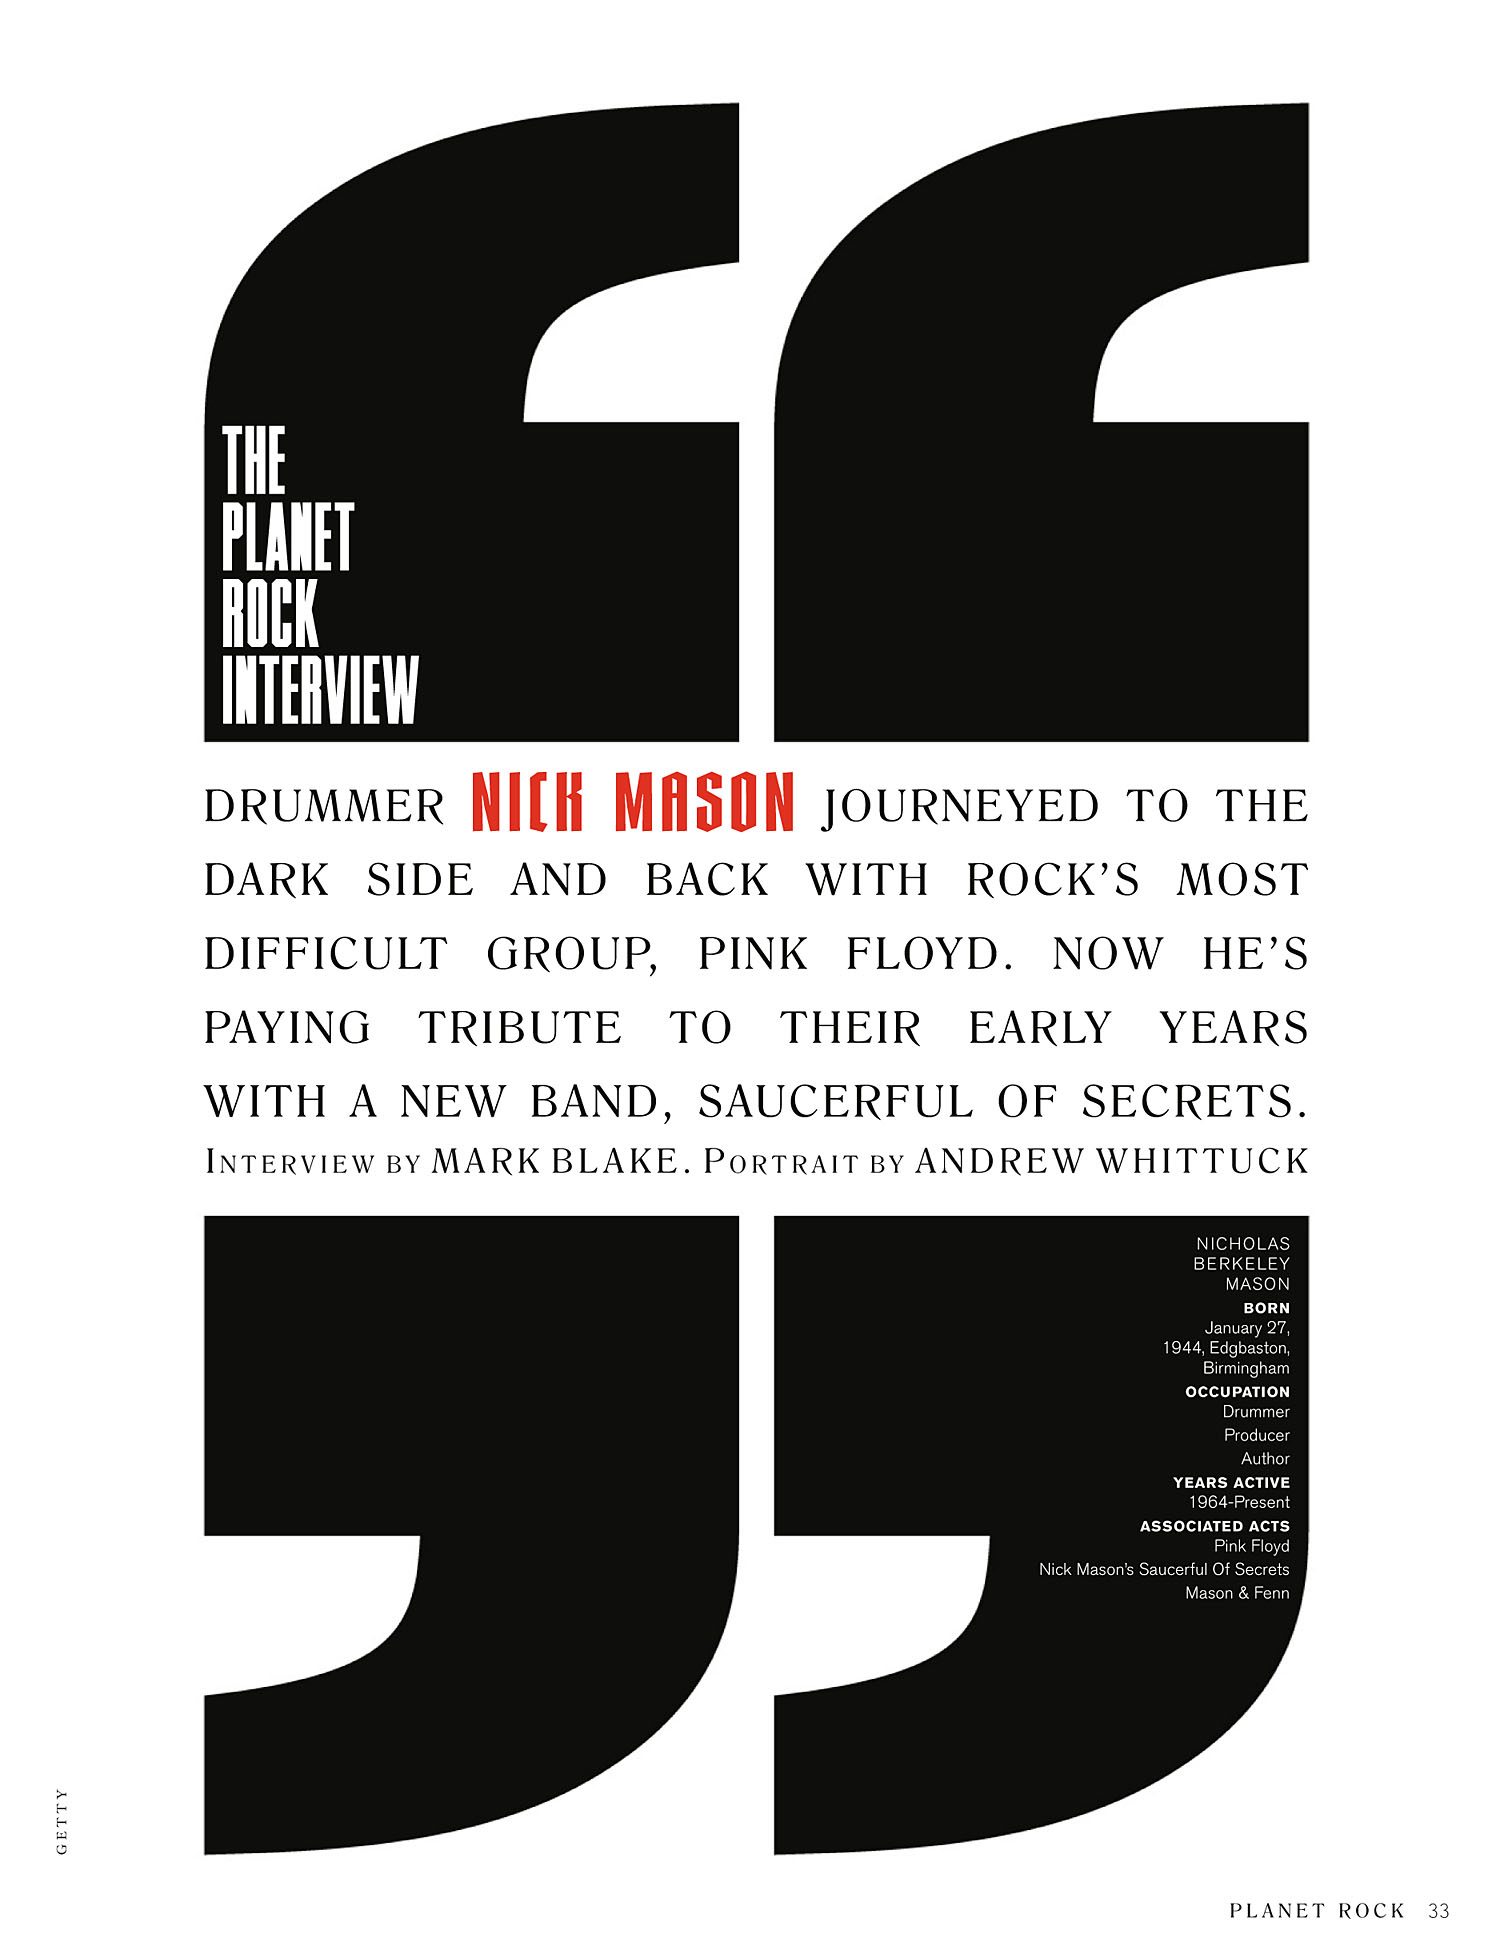 Planet Rock 2020-06 PFloyd 02.jpg